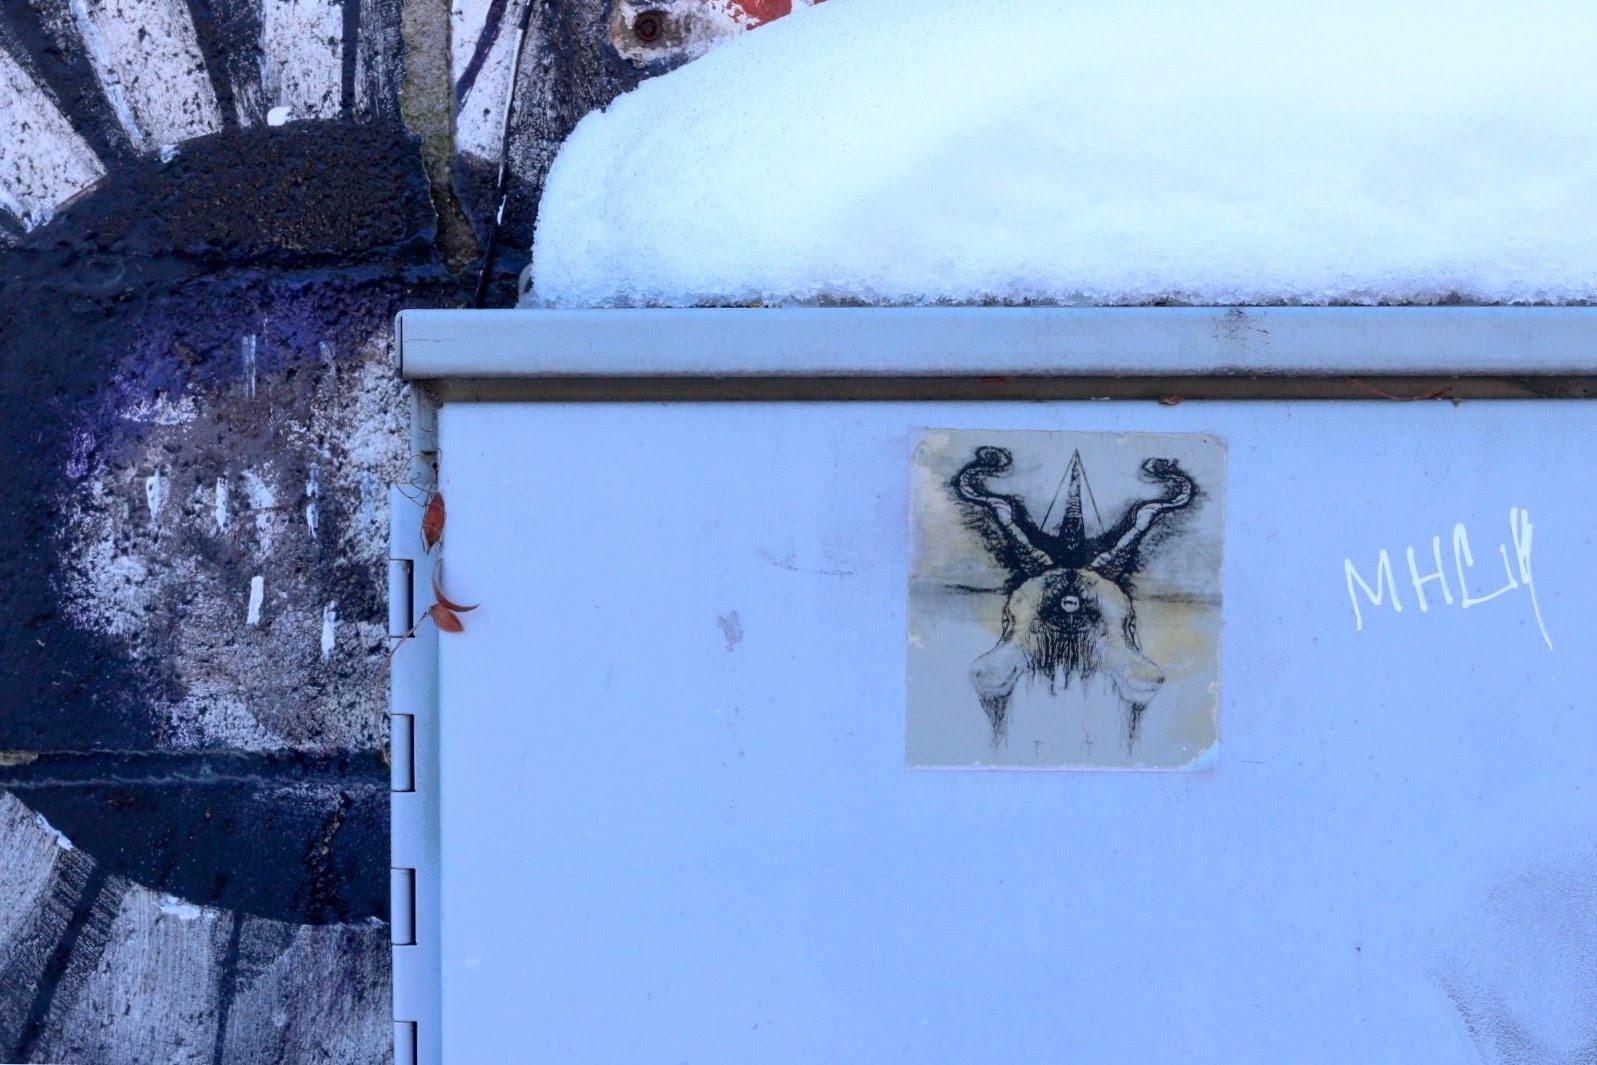 Sticker and graffiti on a utility box near the WORT-FM studio downtown.